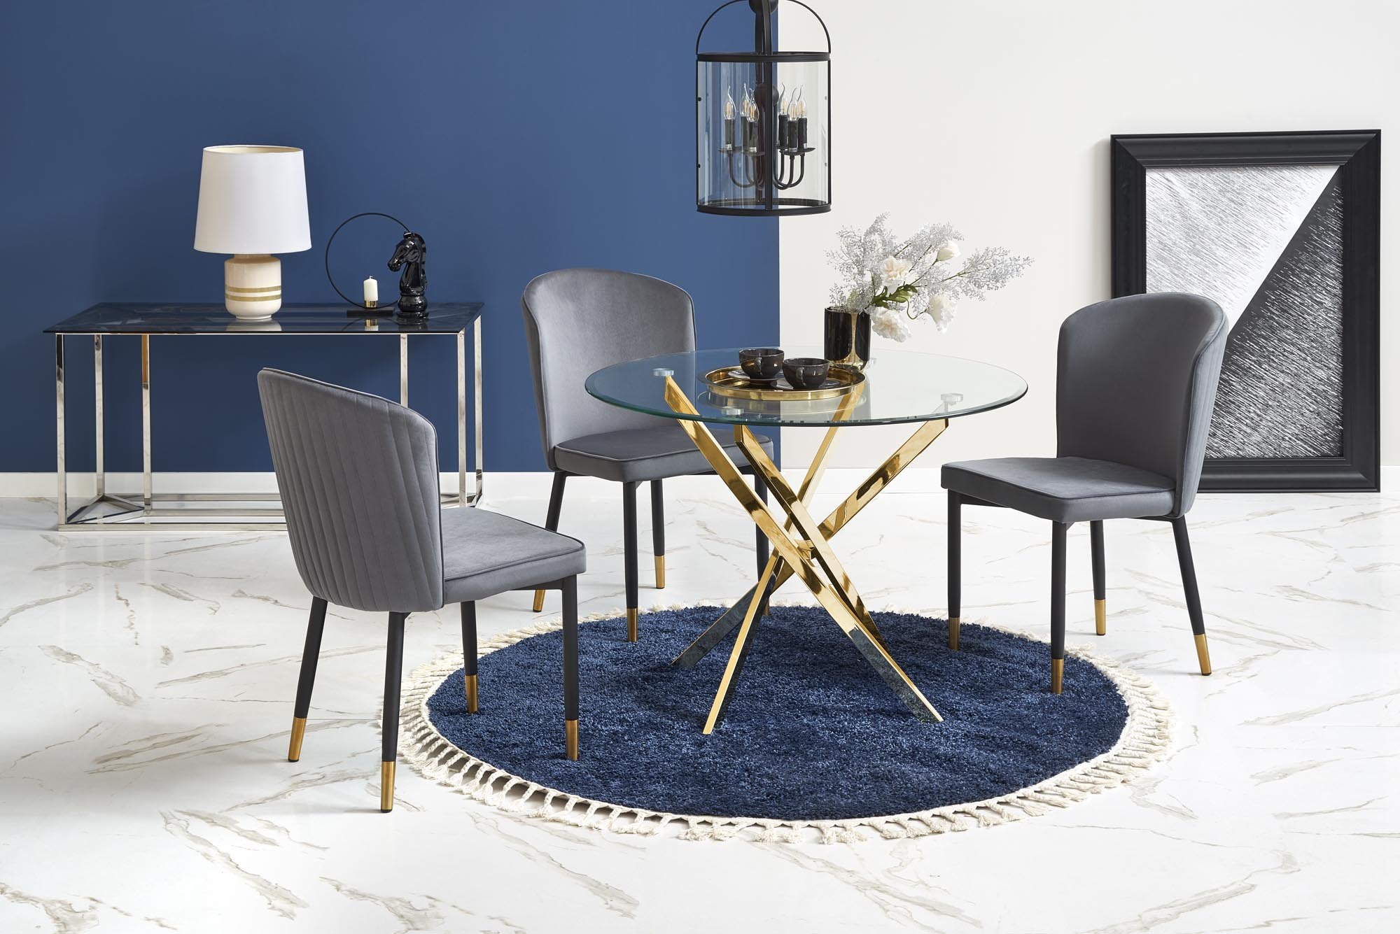 RAYMOND stół, blat - transparentny, nogi - złoty (2p=1szt)